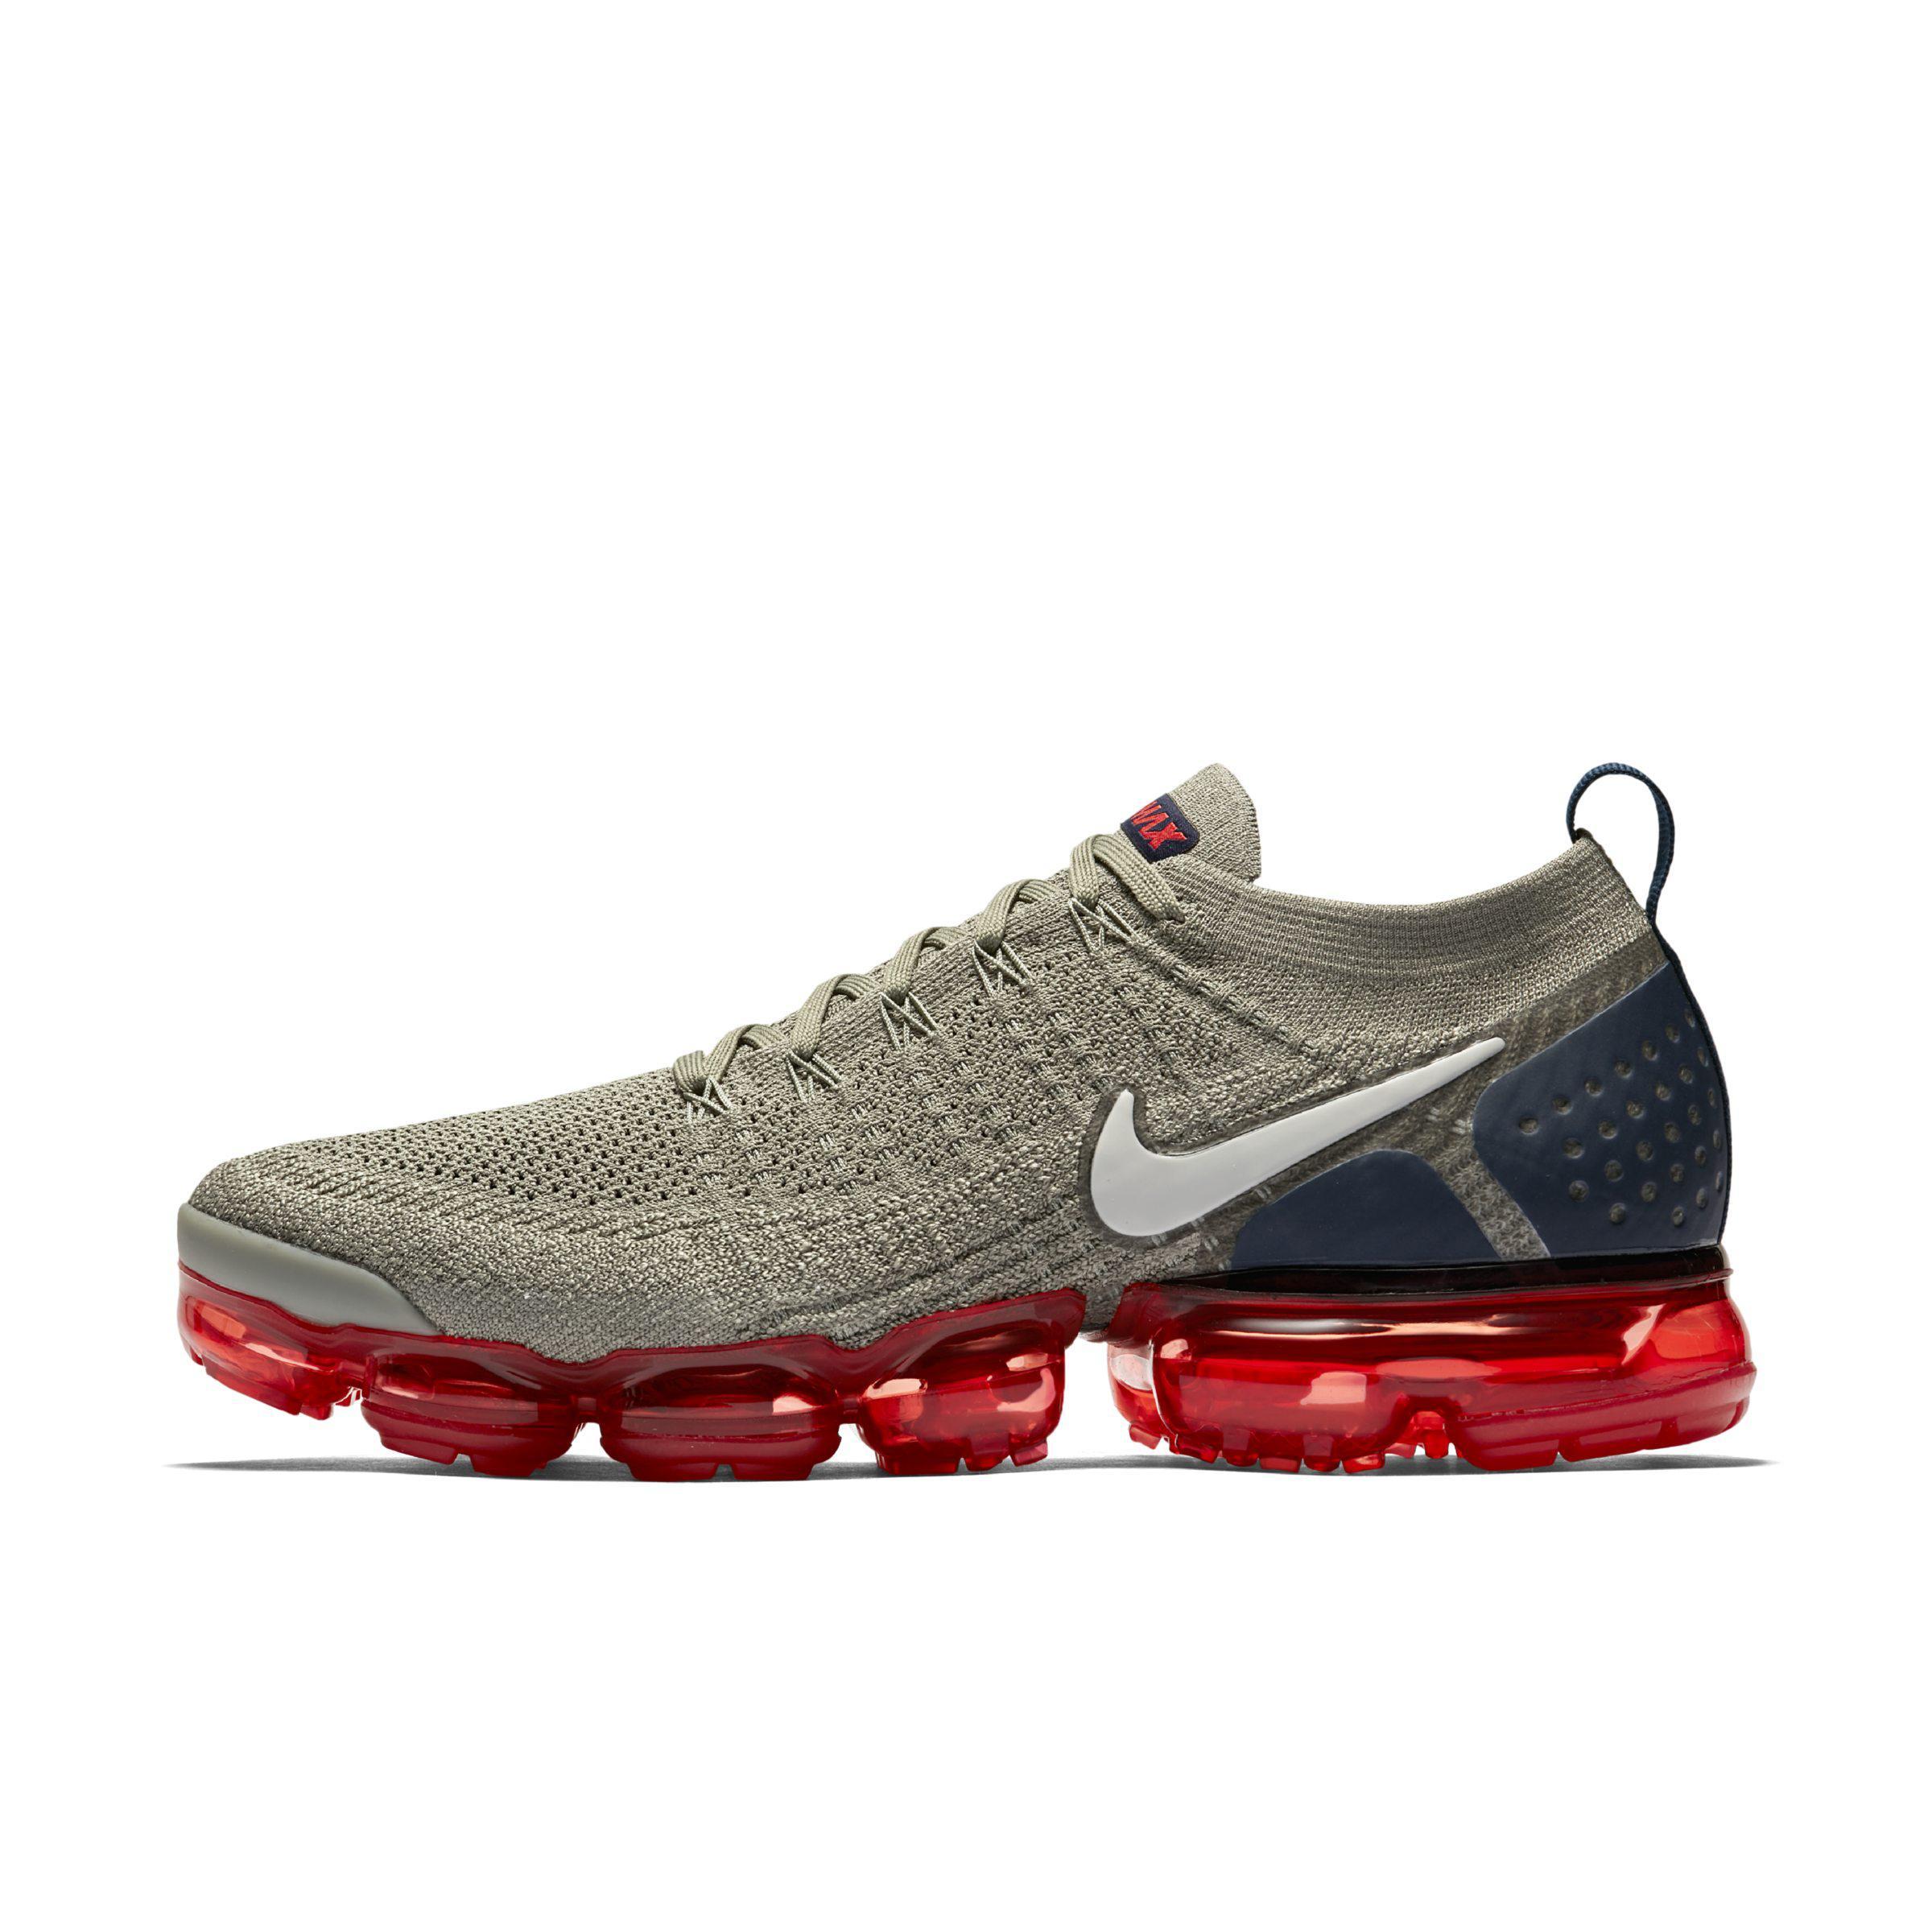 07a60abb57168e Nike Air Vapormax Flyknit 2 Running Shoe in Gray for Men - Lyst